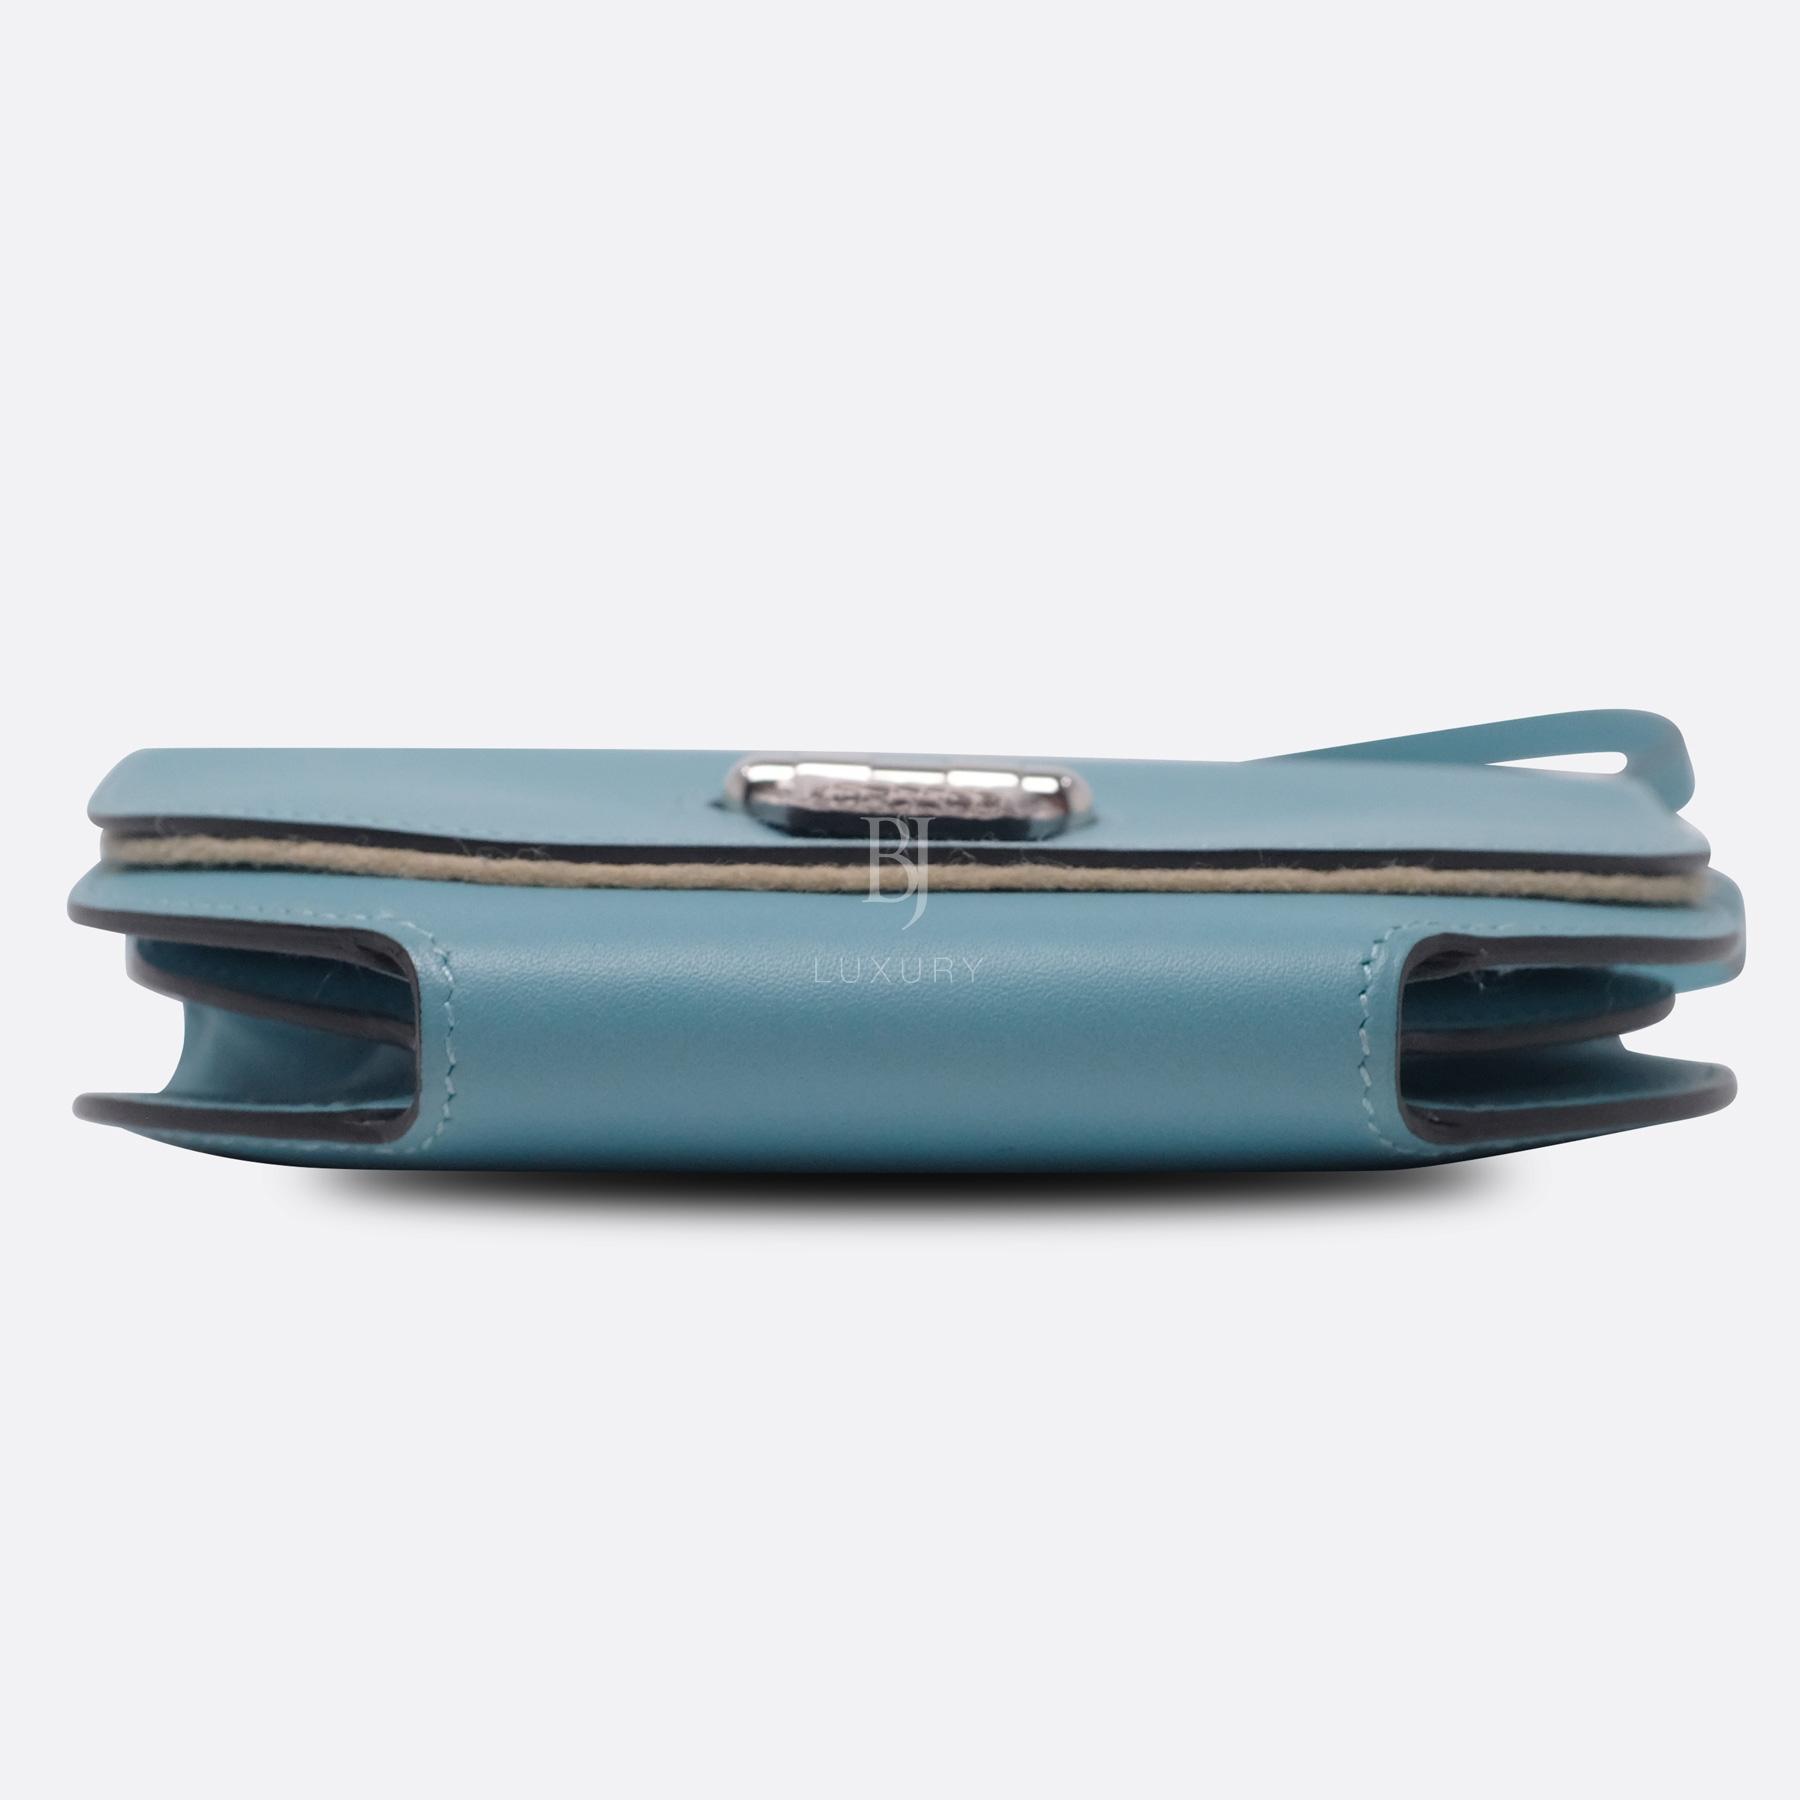 Hermes Conveyor Bag 16 Turquoise Swift Lizard Palladium BJ Luxury 6.jpg